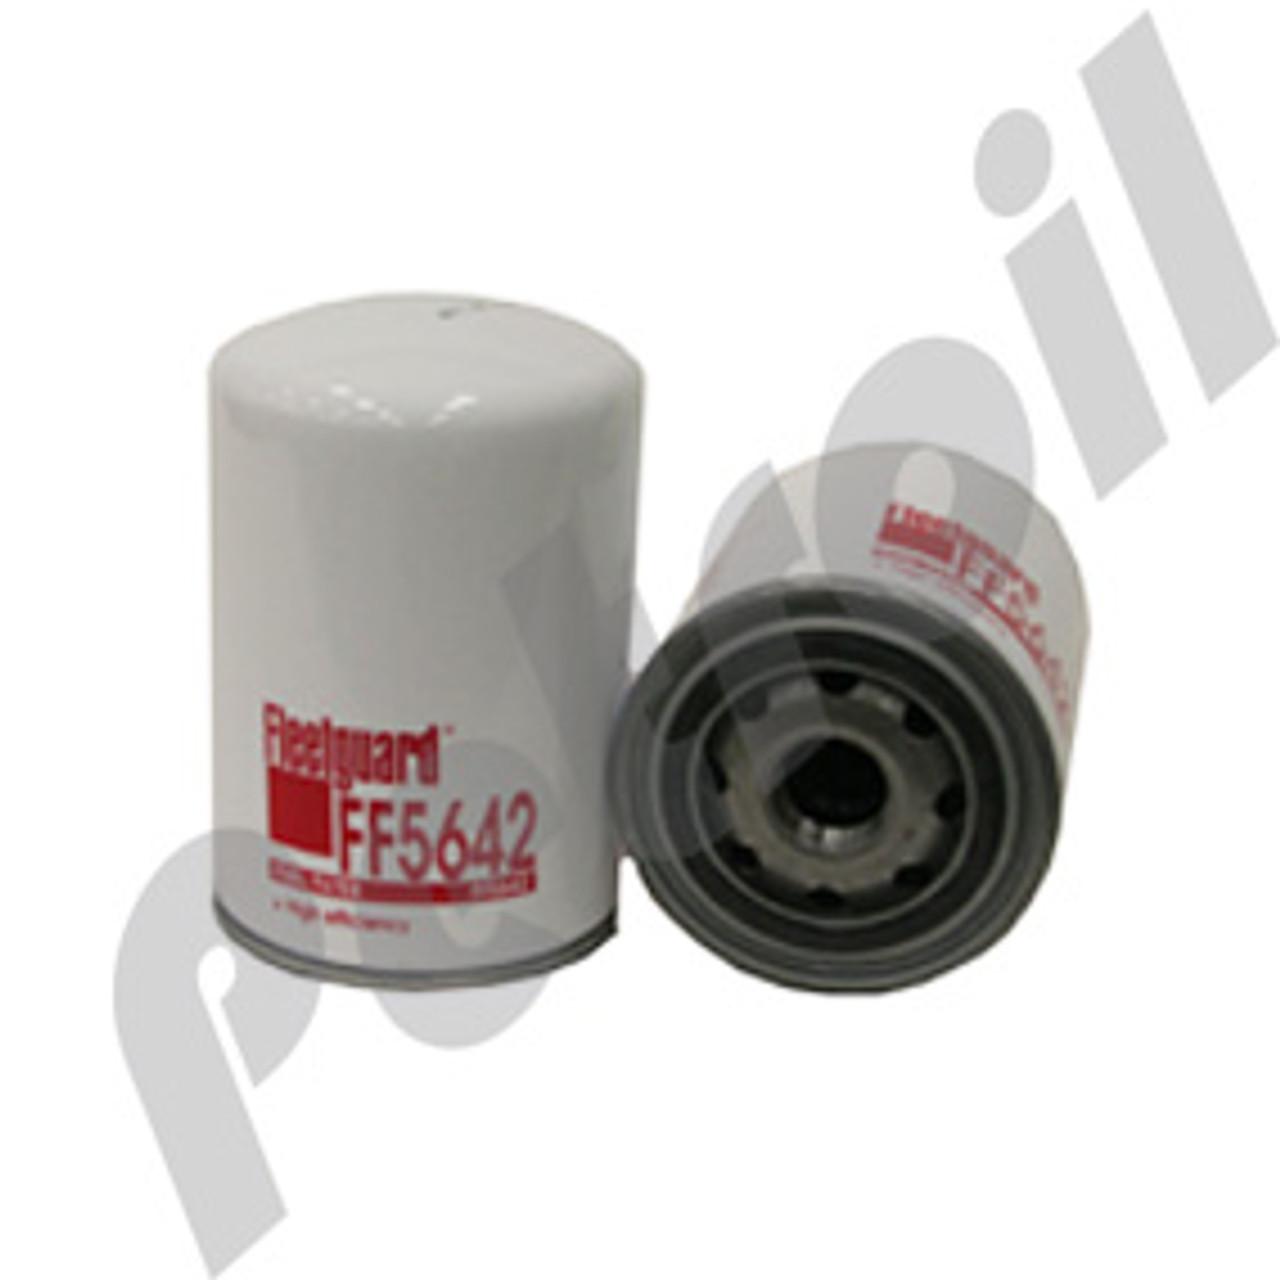 (Case of 12) FF5642 Fleetguard Fuel Filter Spin-on